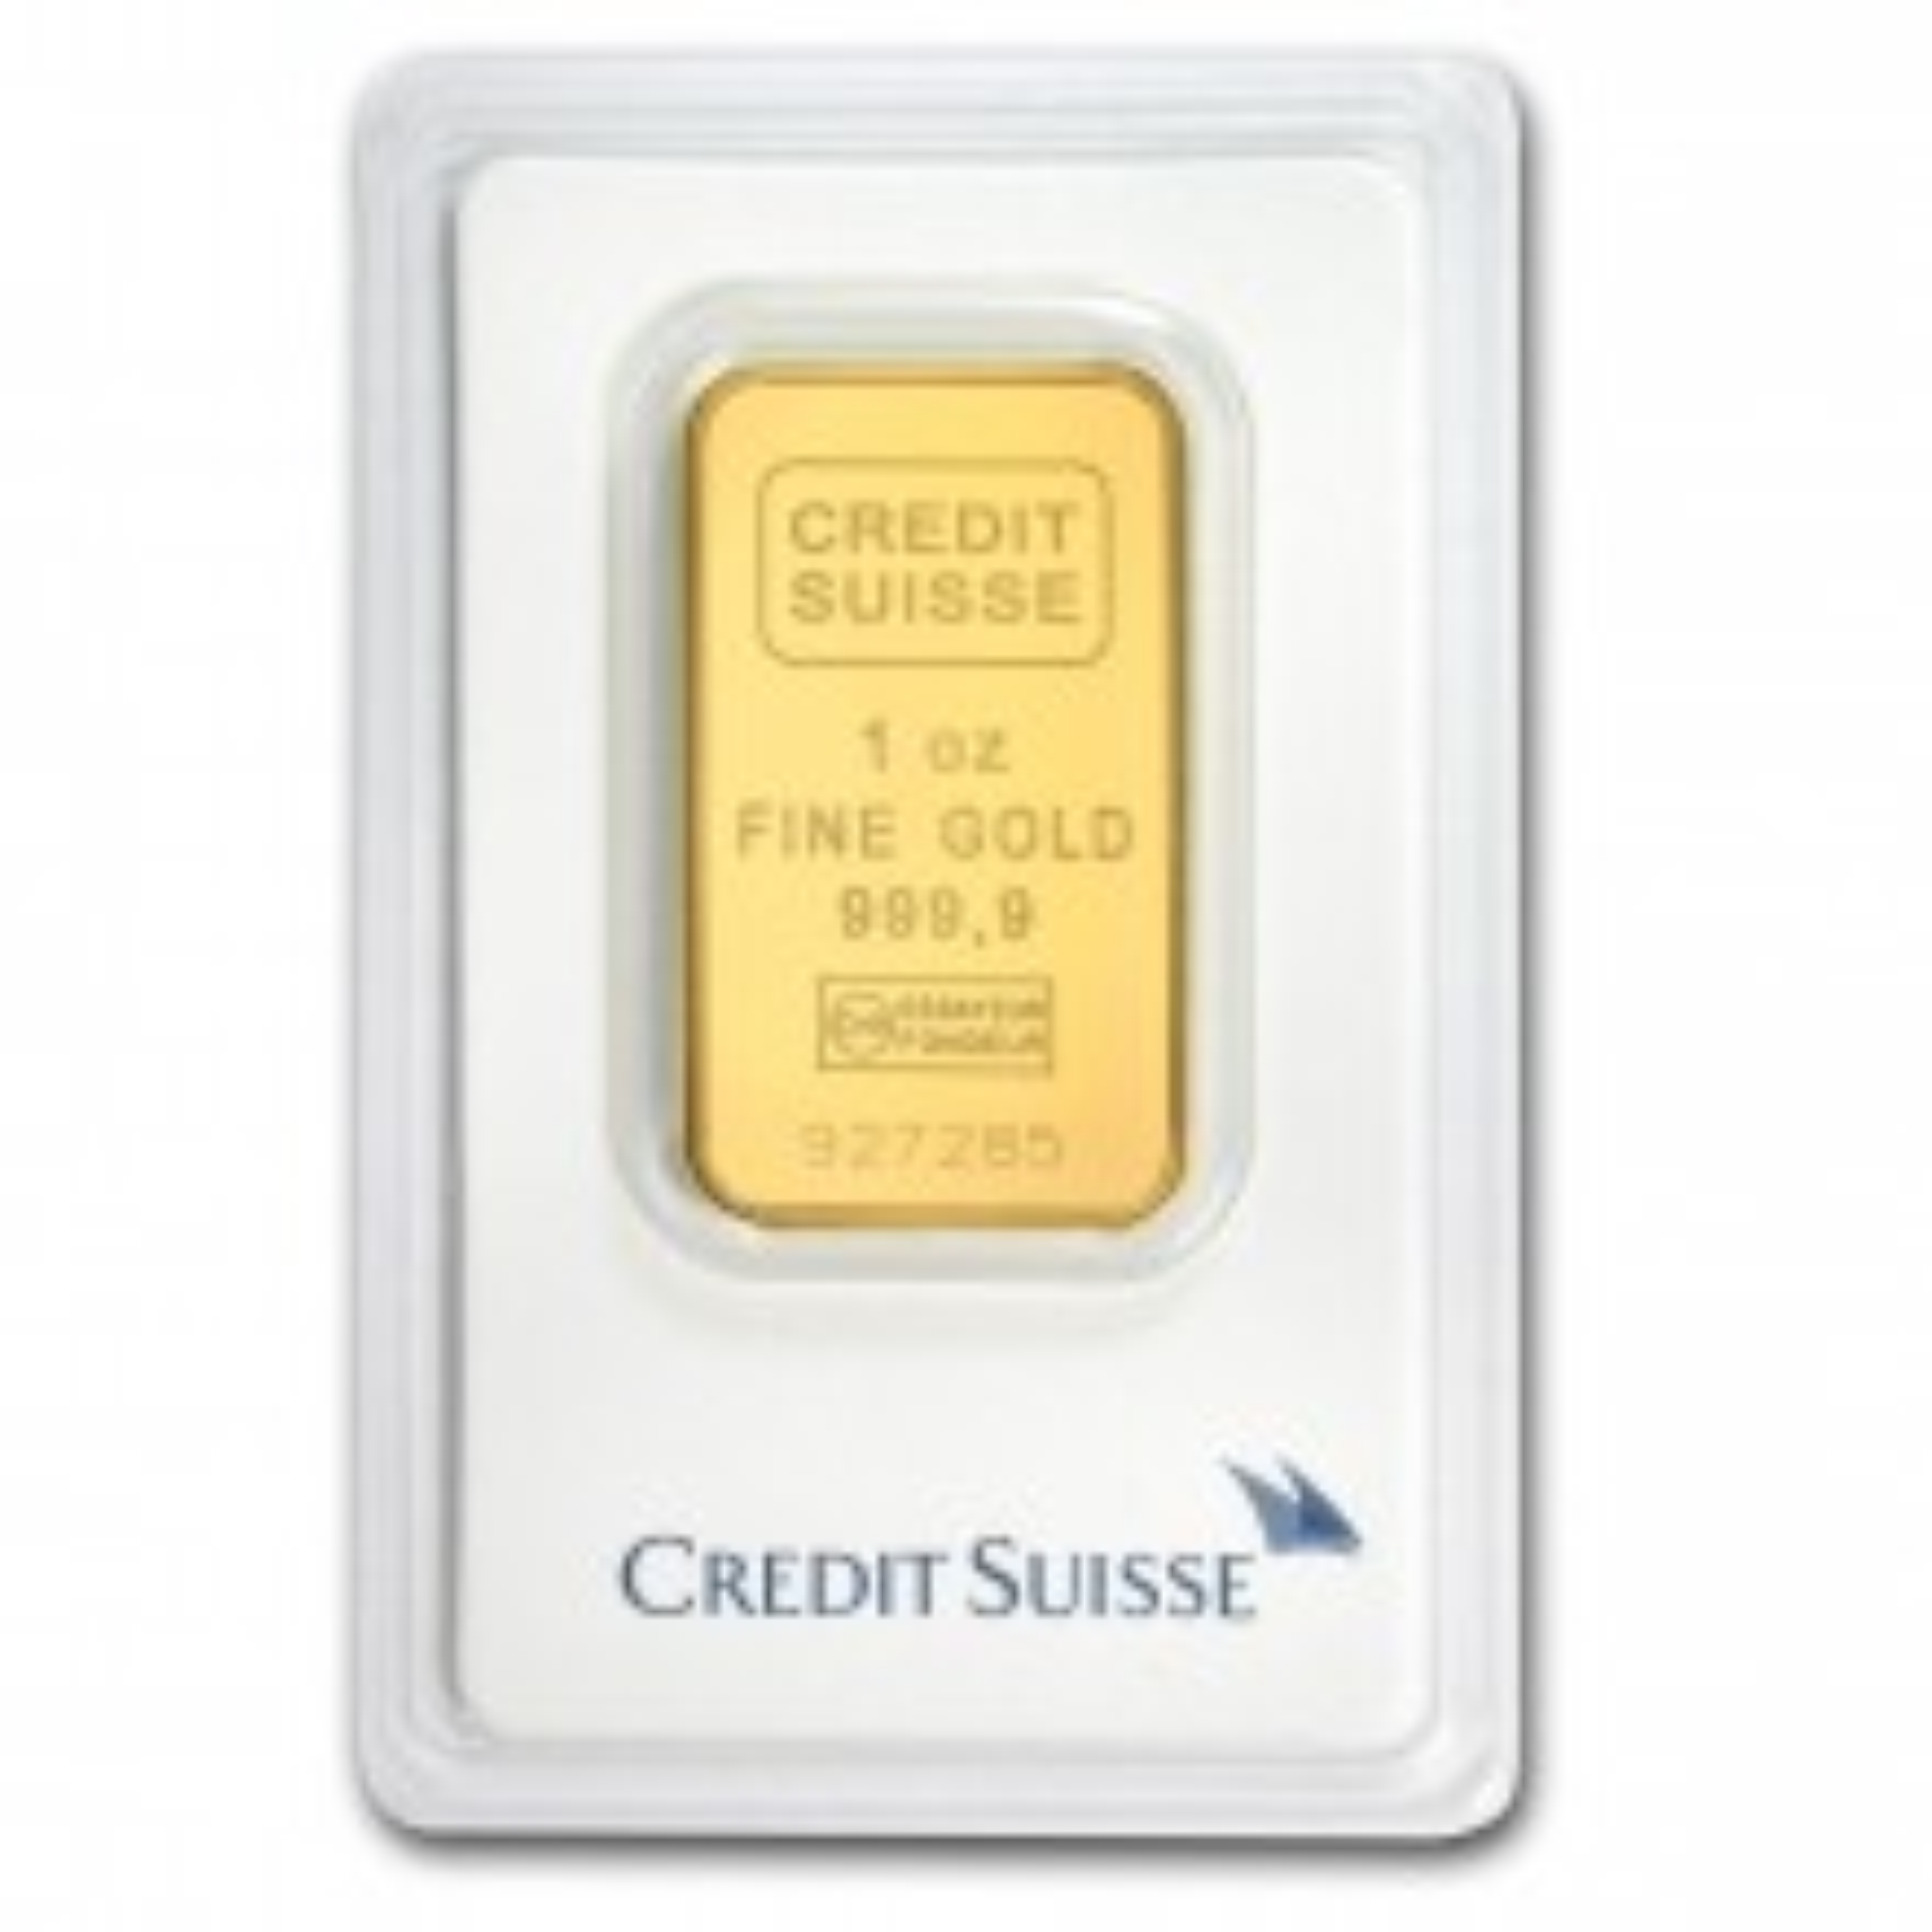 1 troy ounce Goldbar Credit Suisse